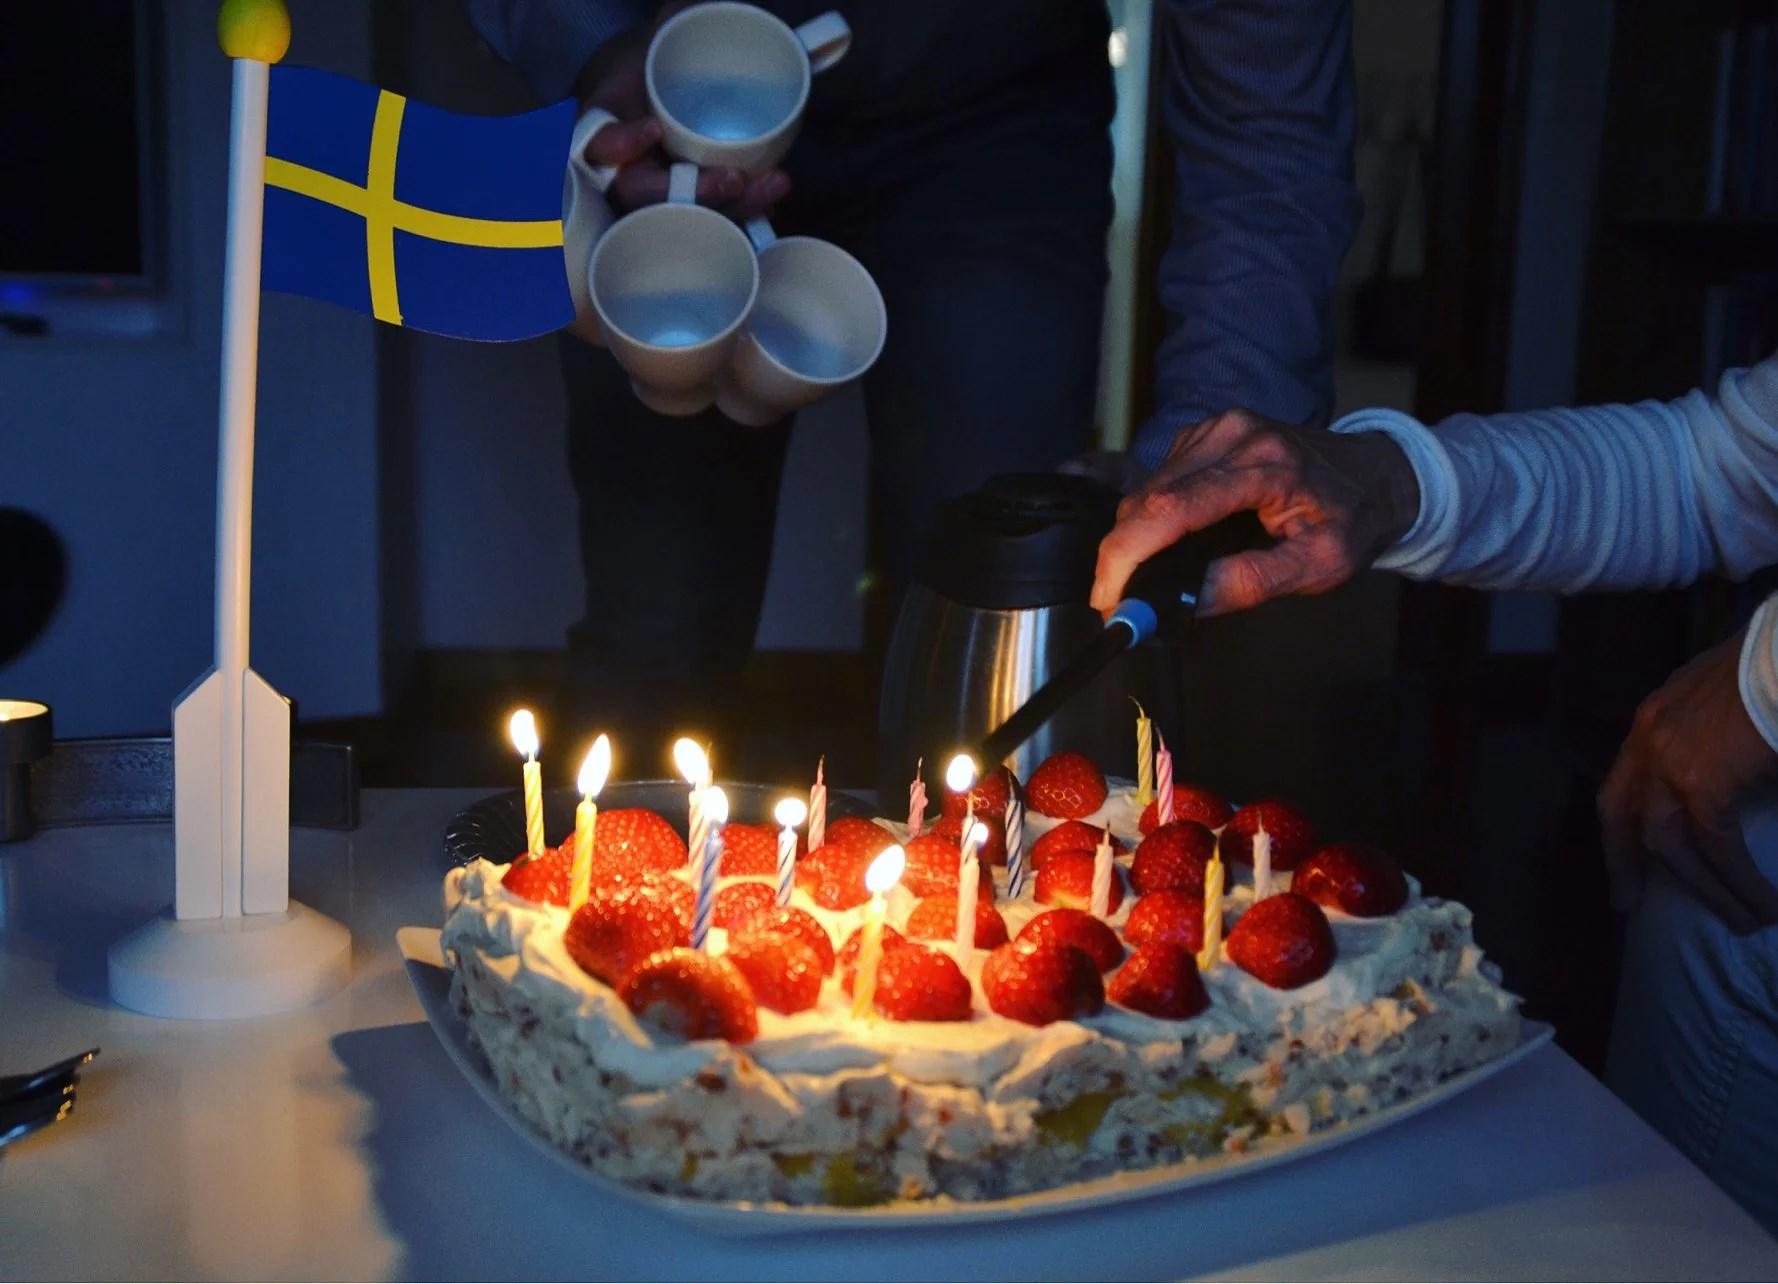 Finaste svärmors födelsedag